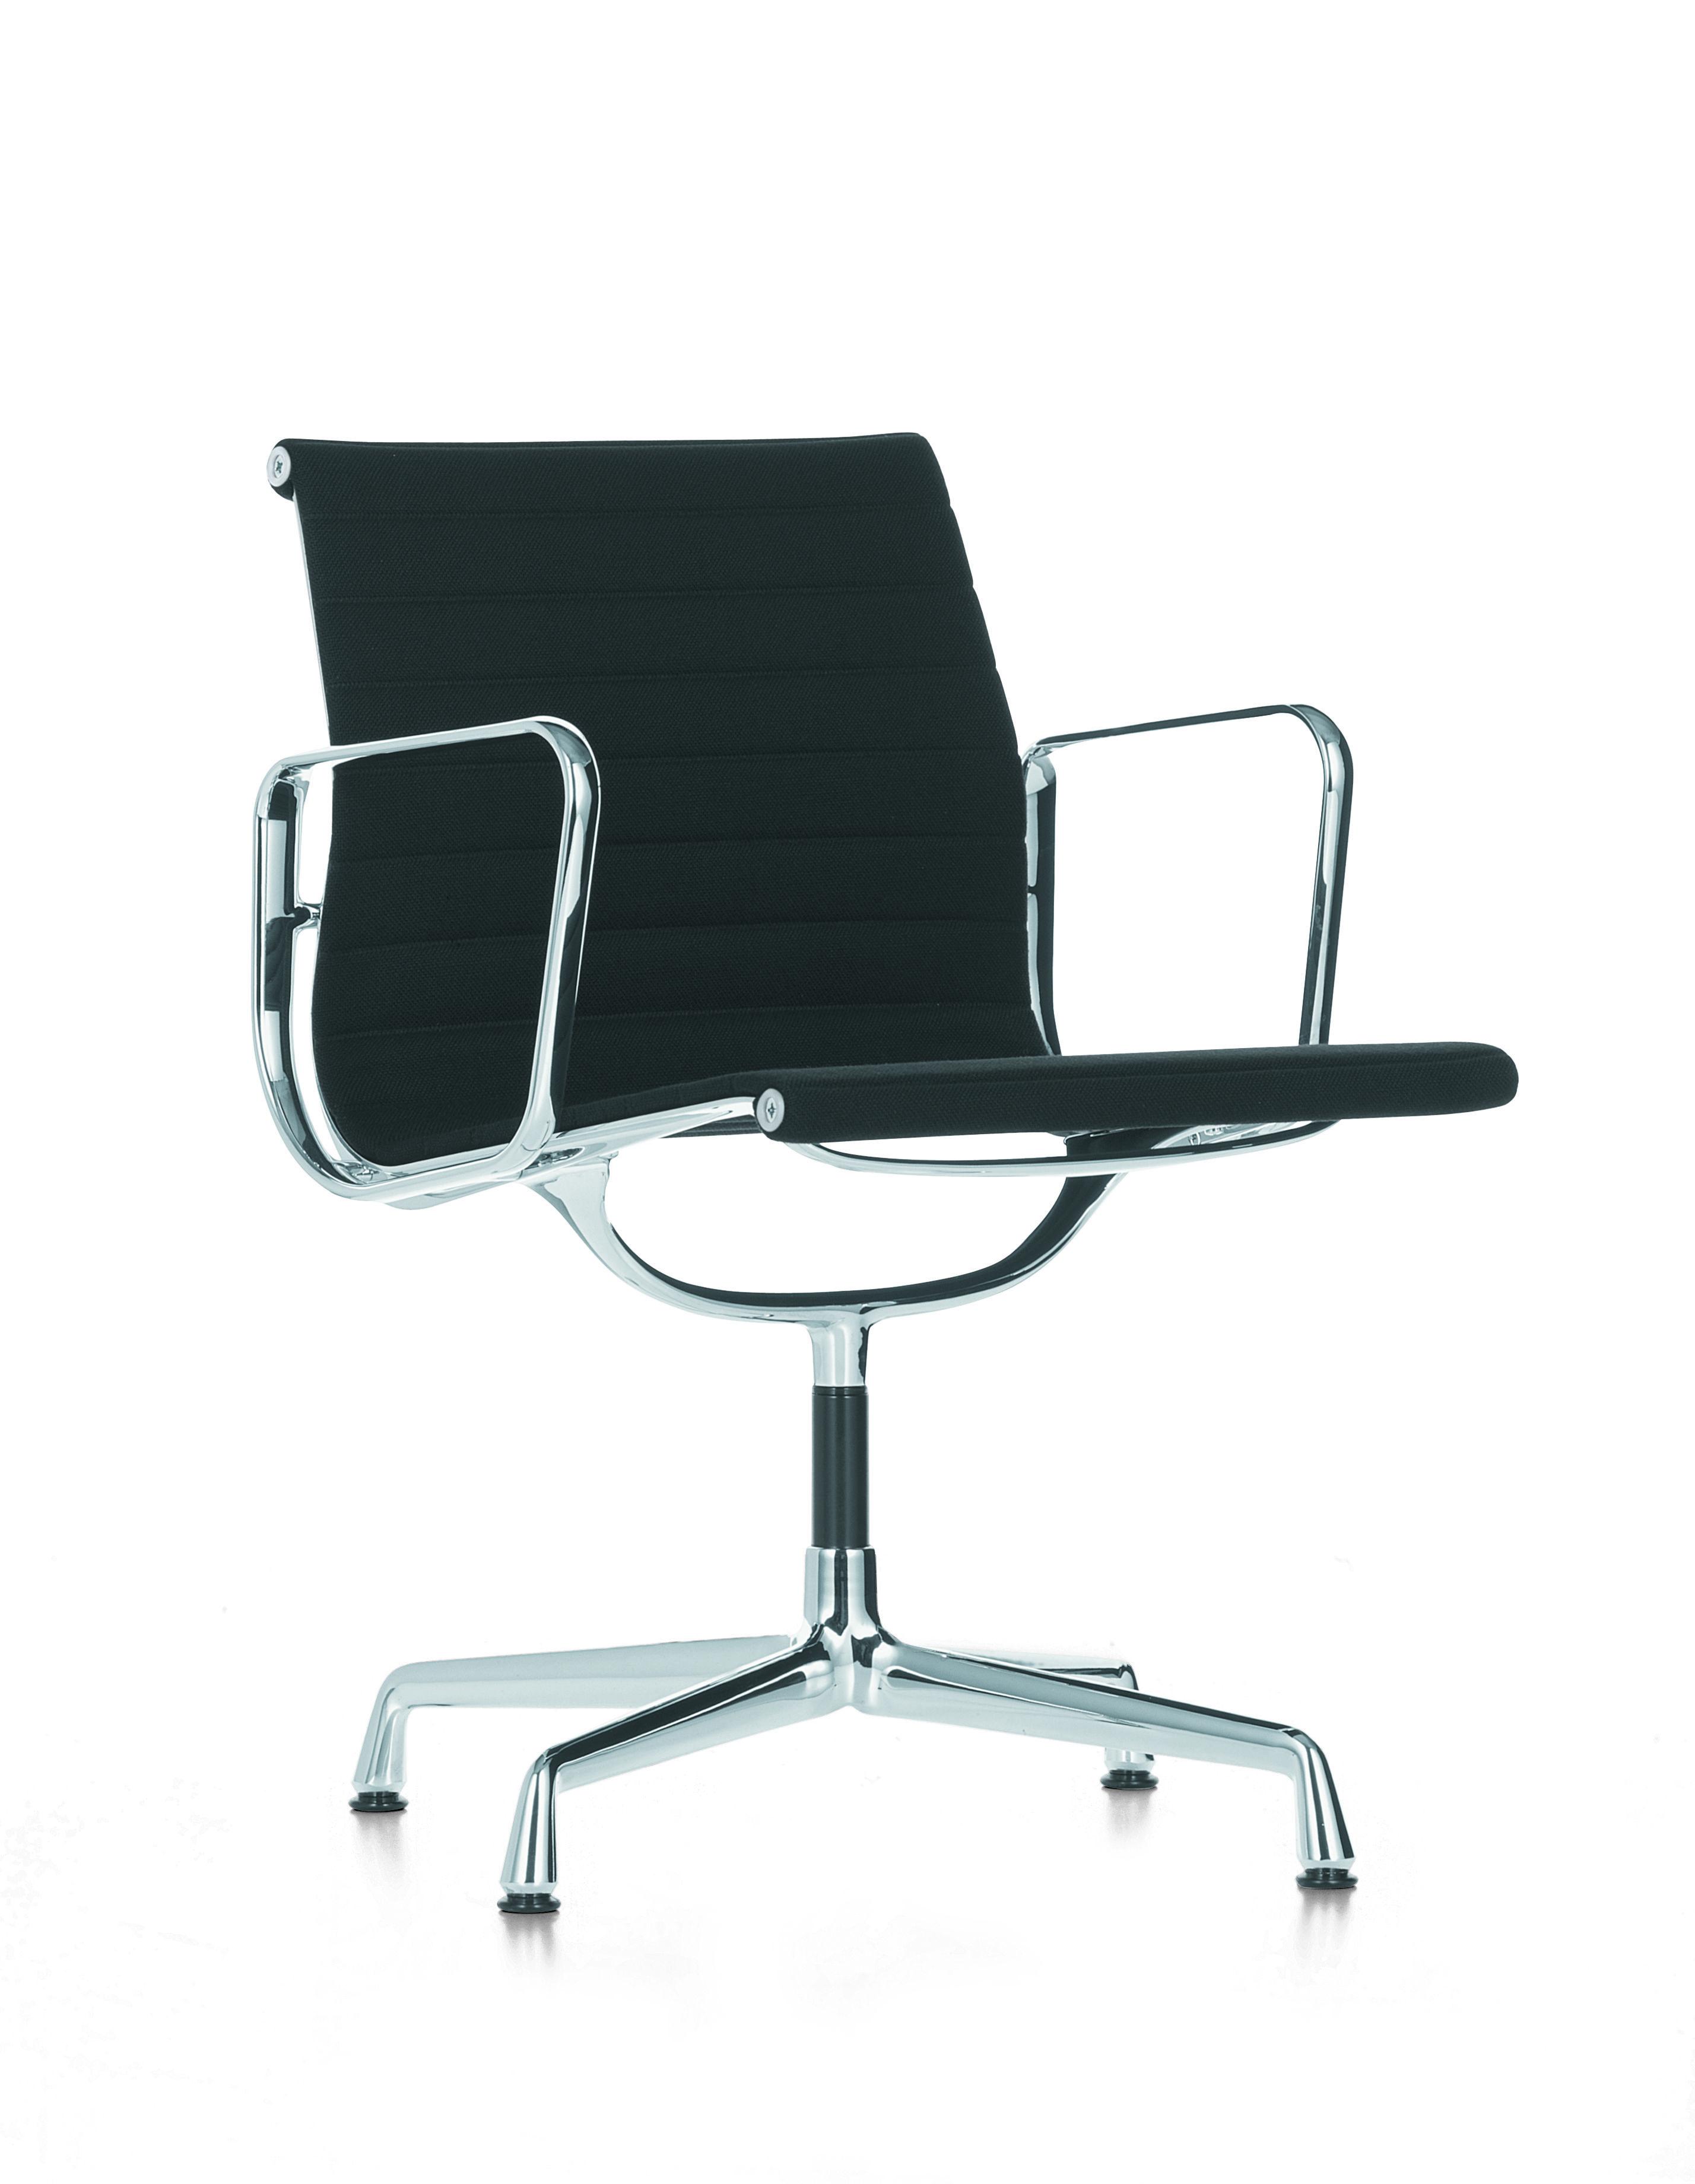 Alu ChairStühleStuhl Vitra Stuhl Group Aluminium nvN0m8Ow